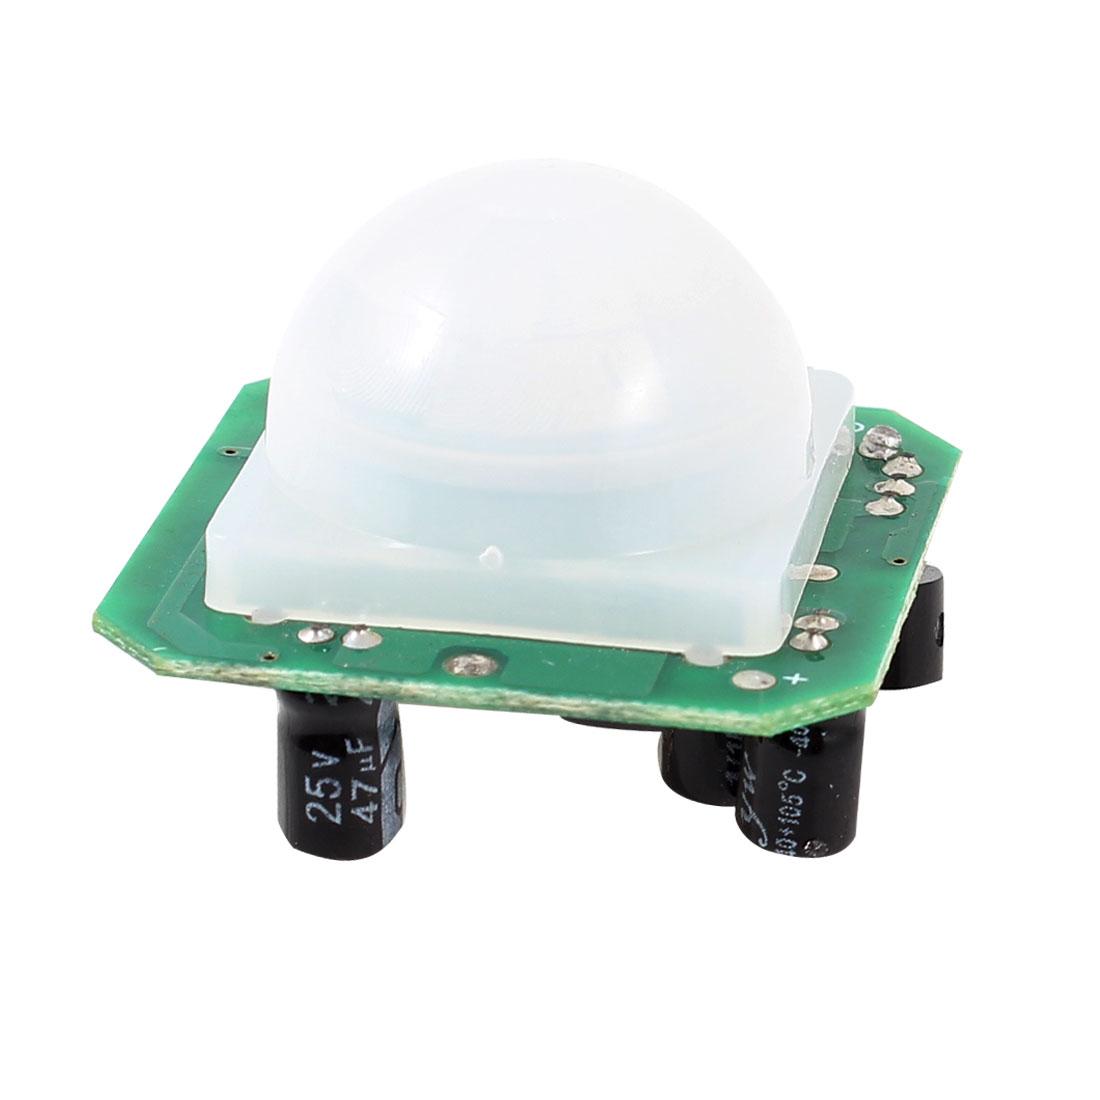 Automatic Light Illumination JL-004 IR Motion Sensor Module DC 3.5-15V